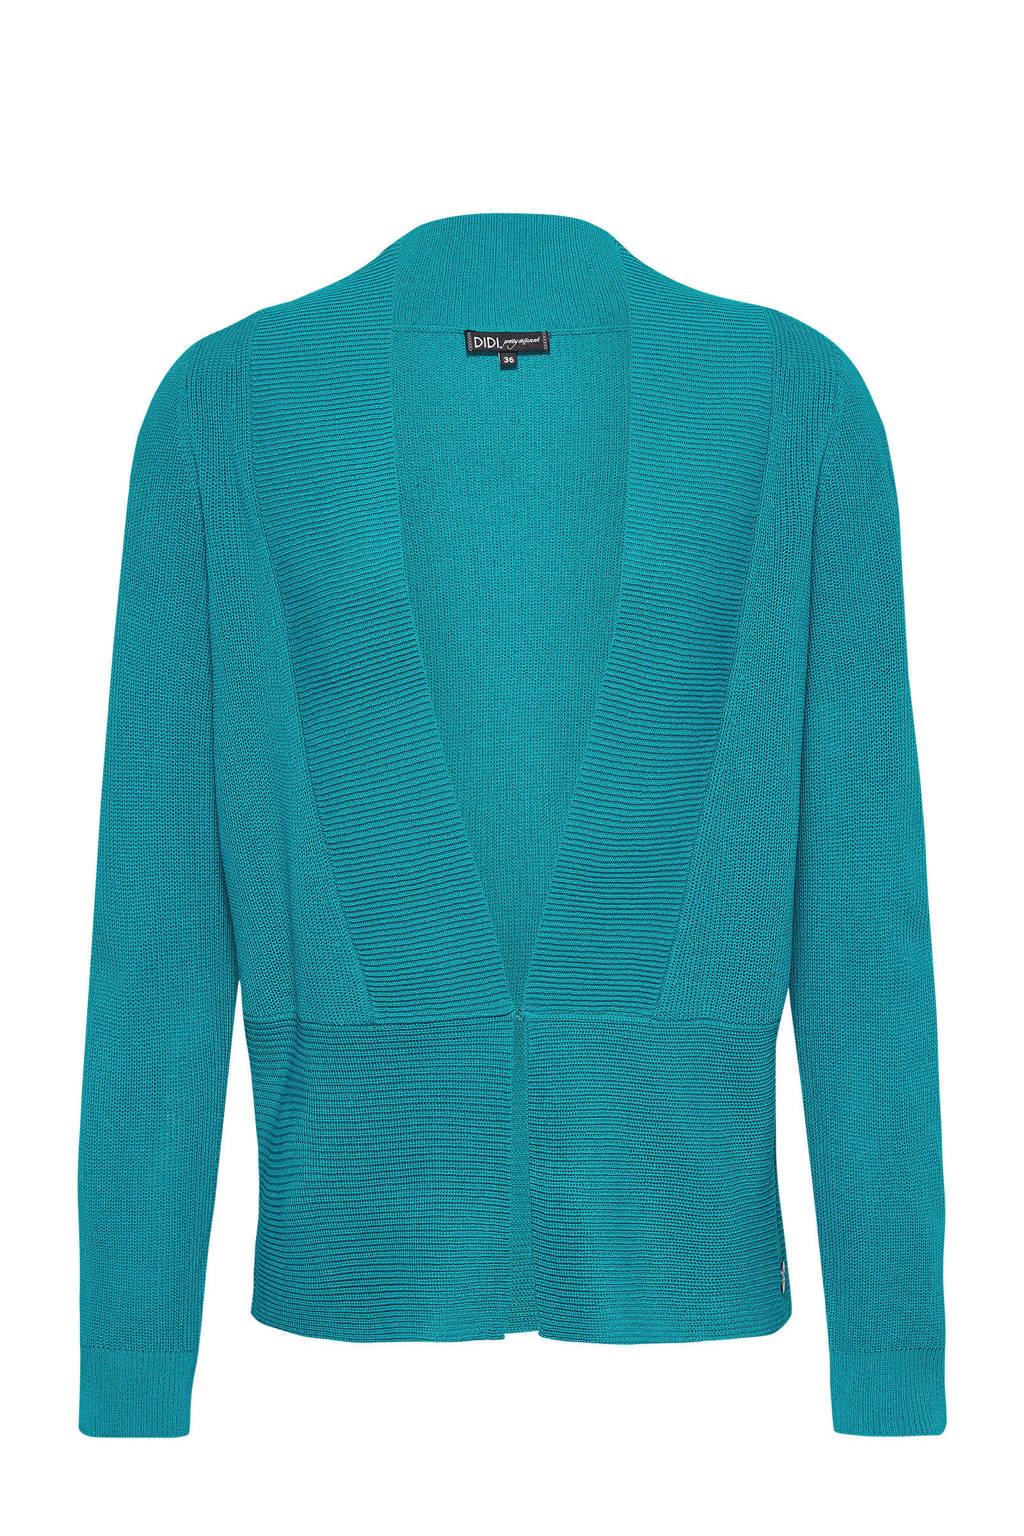 Didi vest turquoise, Turquoise